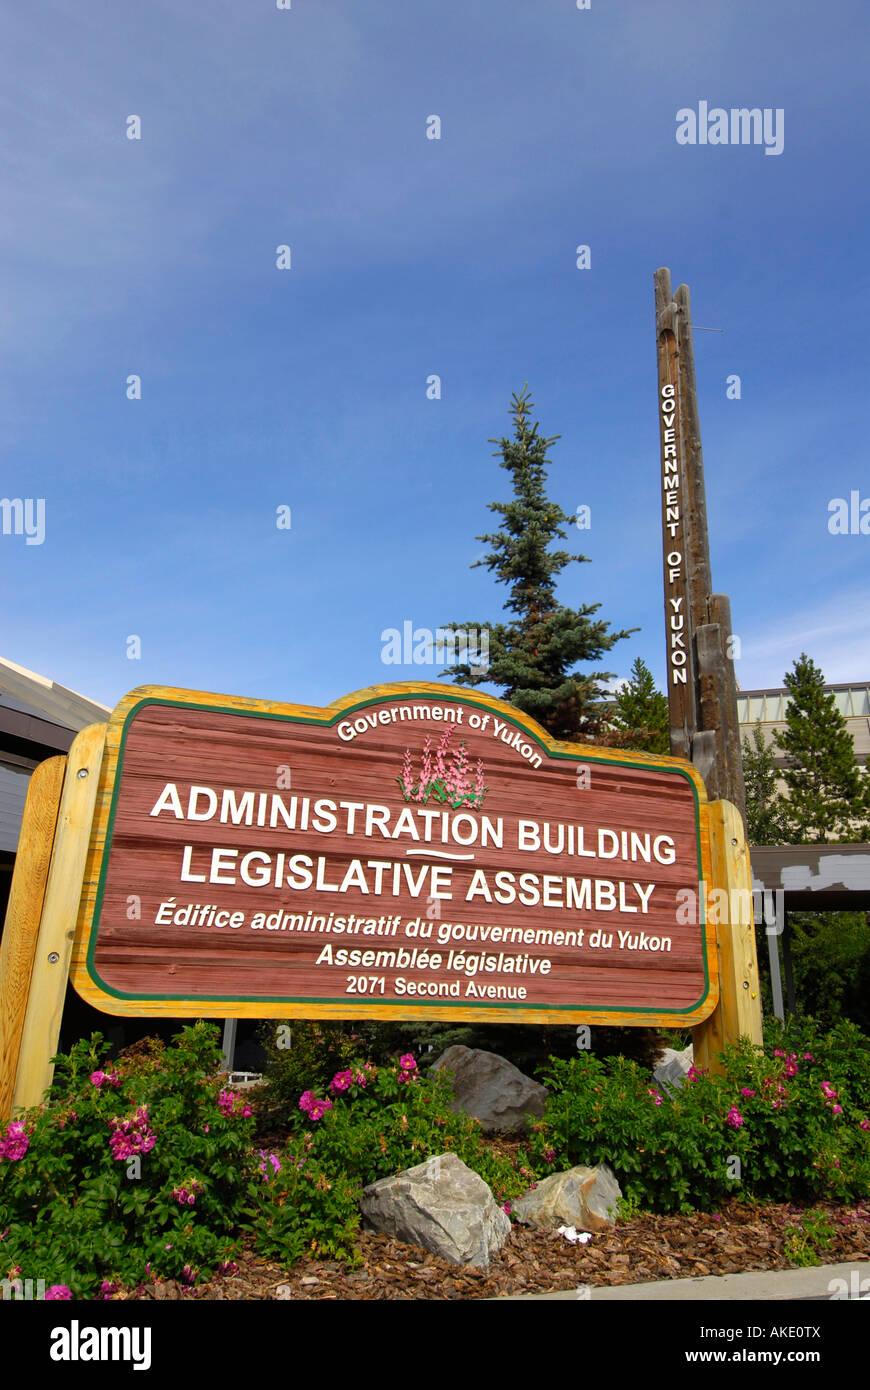 Administration Building Legislative Assembly Whitehorse Yukon Stock Photo Alamy